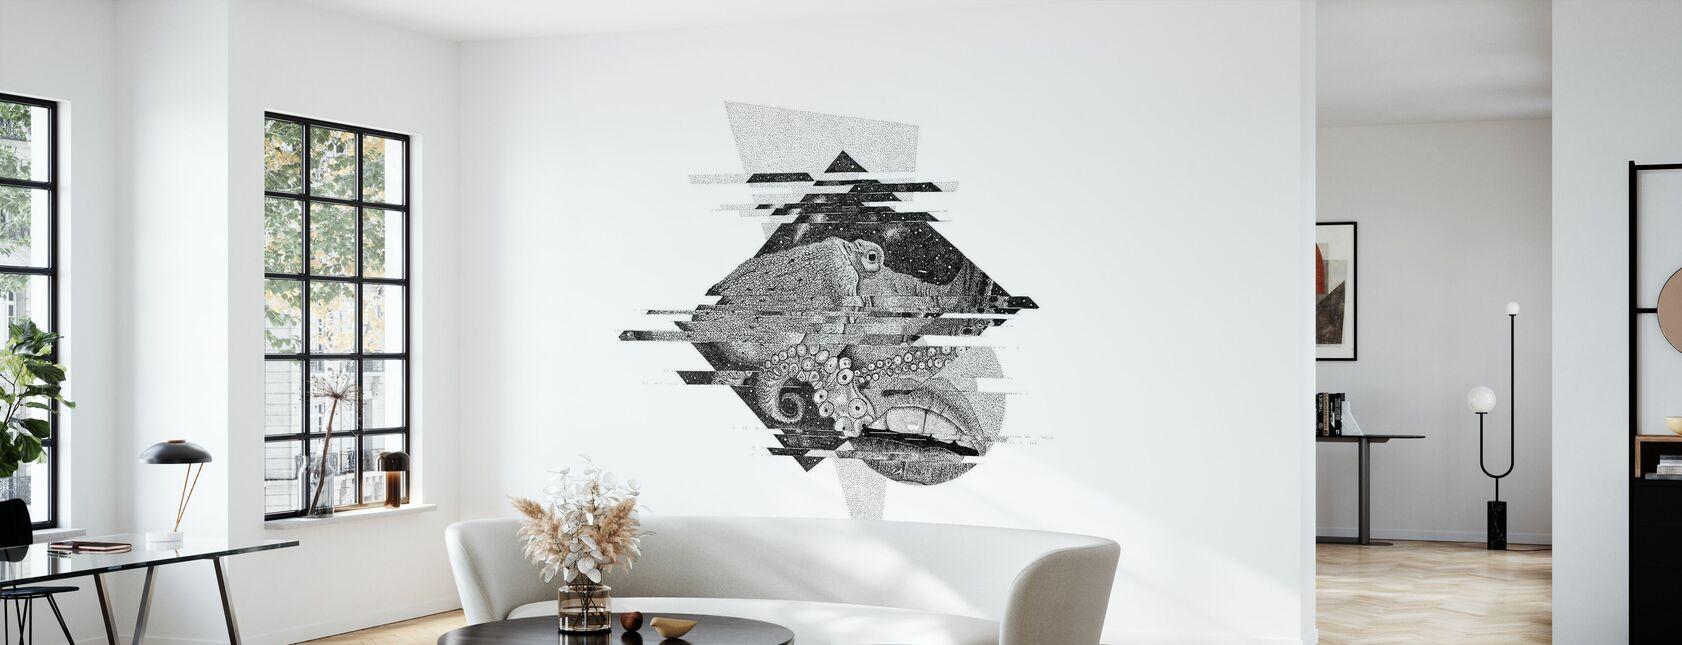 Interrupted Universe I - Wallpaper - Living Room